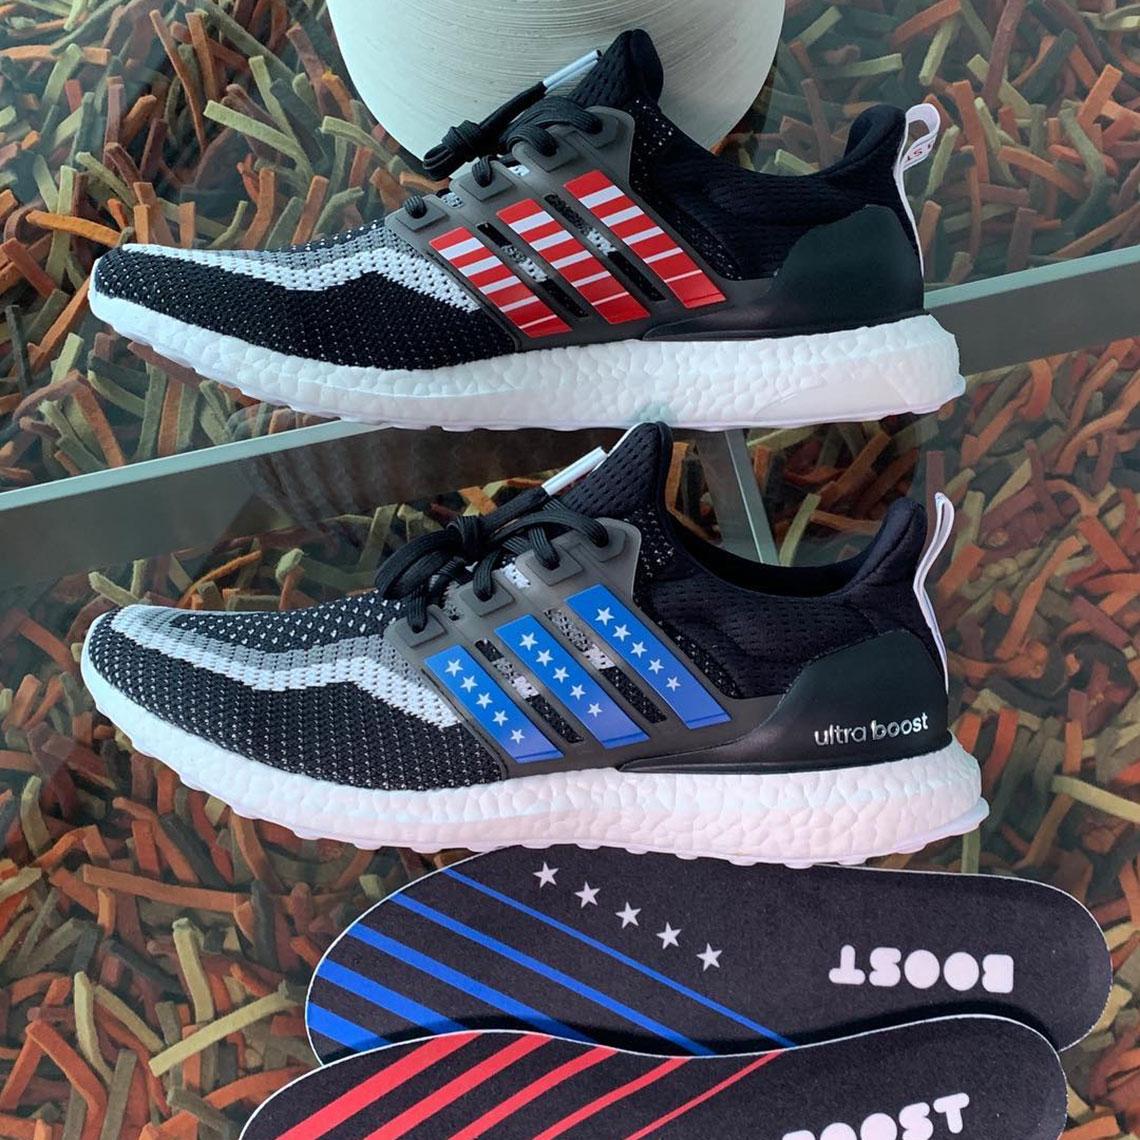 2a71a2e15f730 adidas Ultra Boost 2.0 Stars and Stripes EG8100 Release Info ...